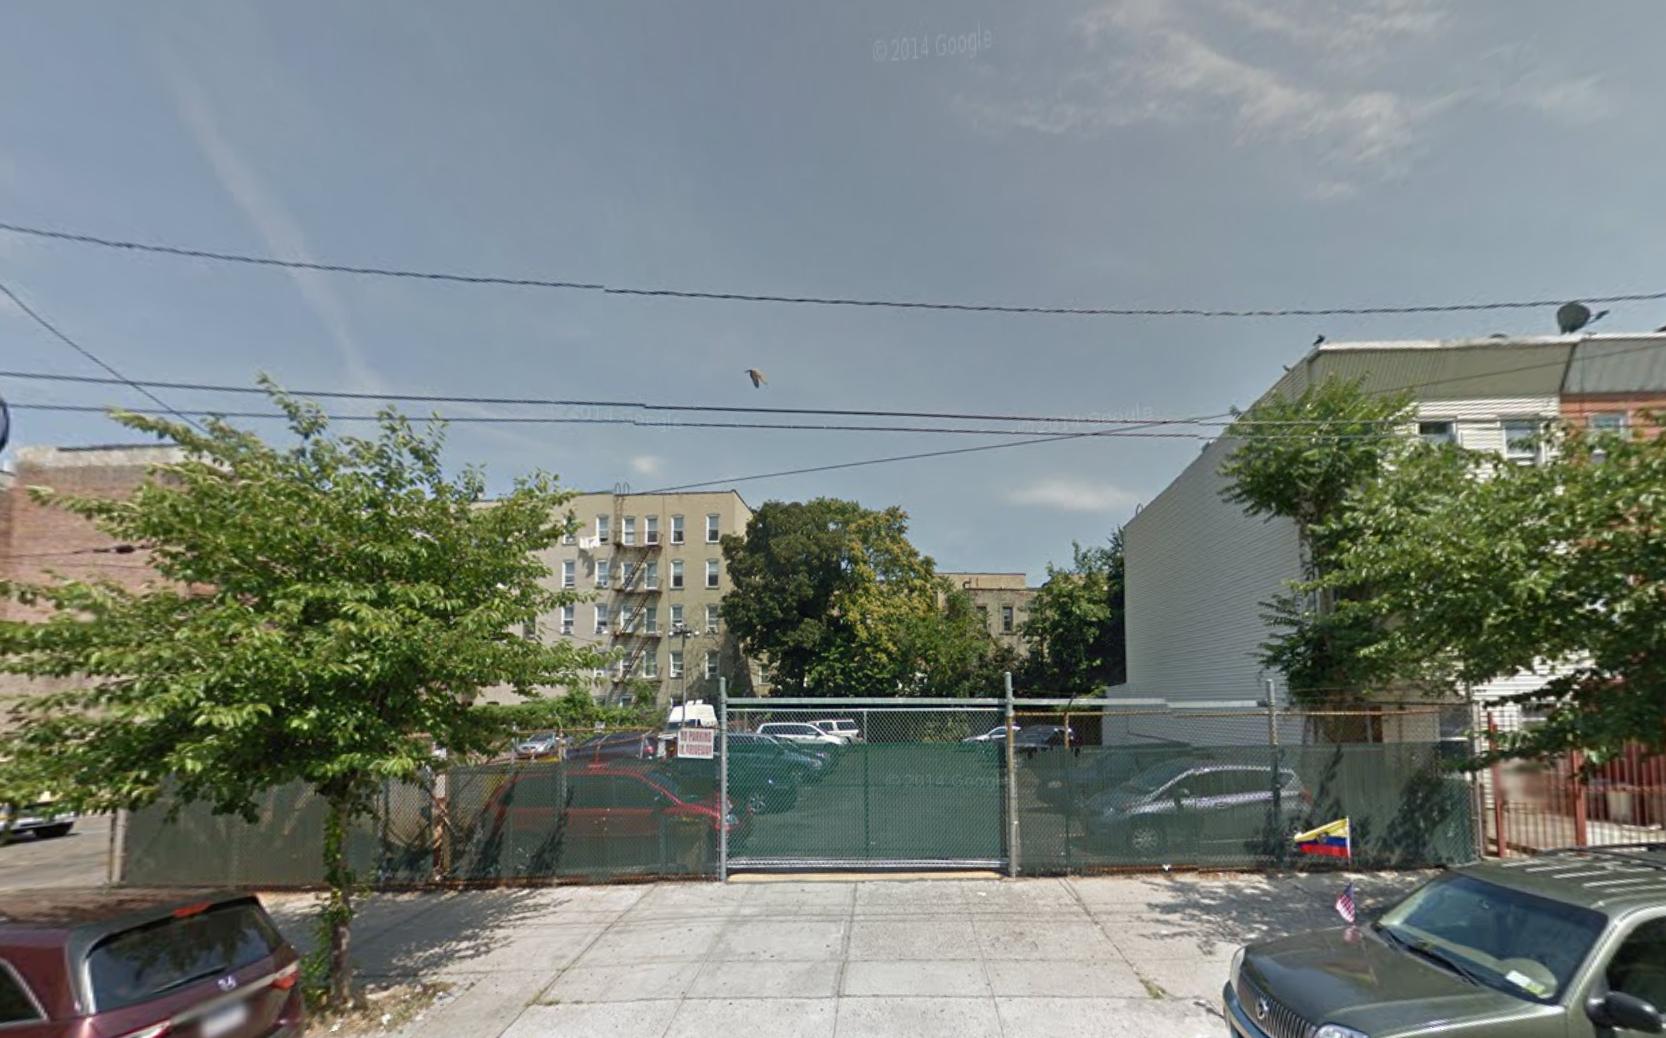 536 Wales Avenue, image via Google Maps